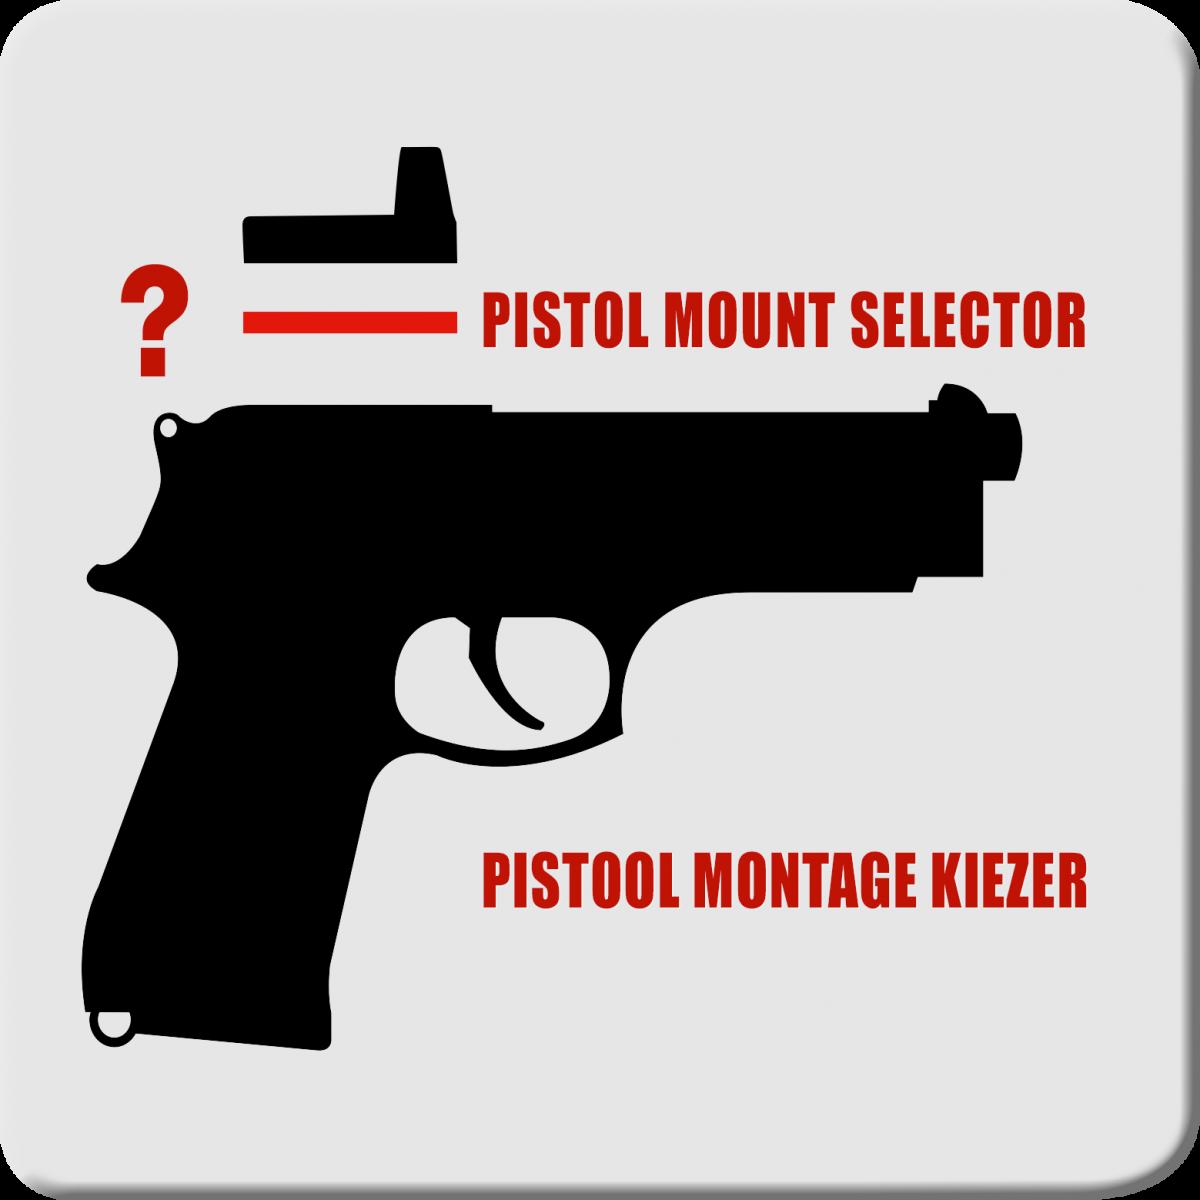 Pistol mount selector | Pistool montage kiezer